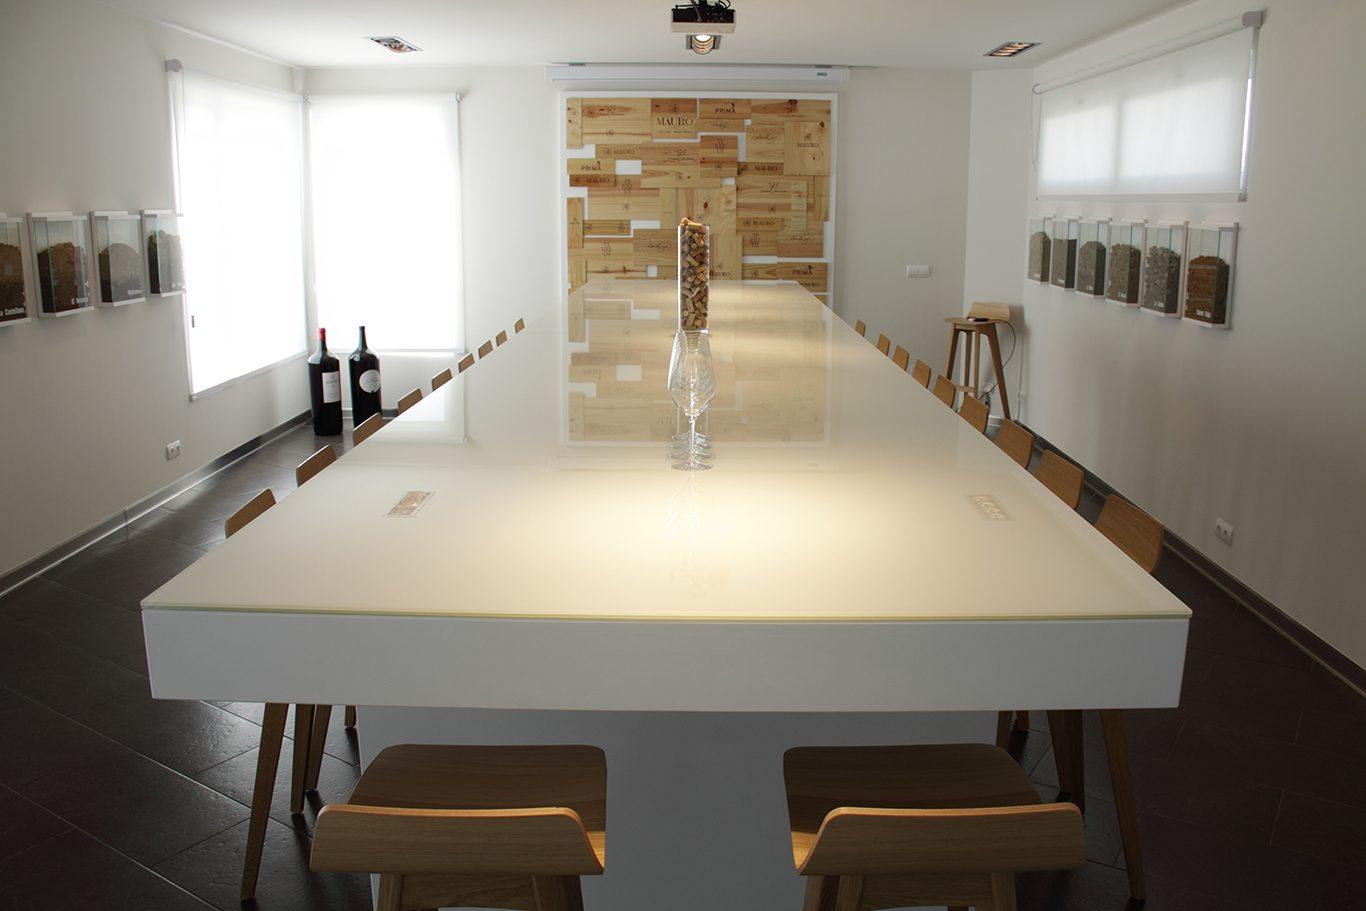 Sala de catas bodegas Mauro mesa frontal   Muebles de oficina Spacio